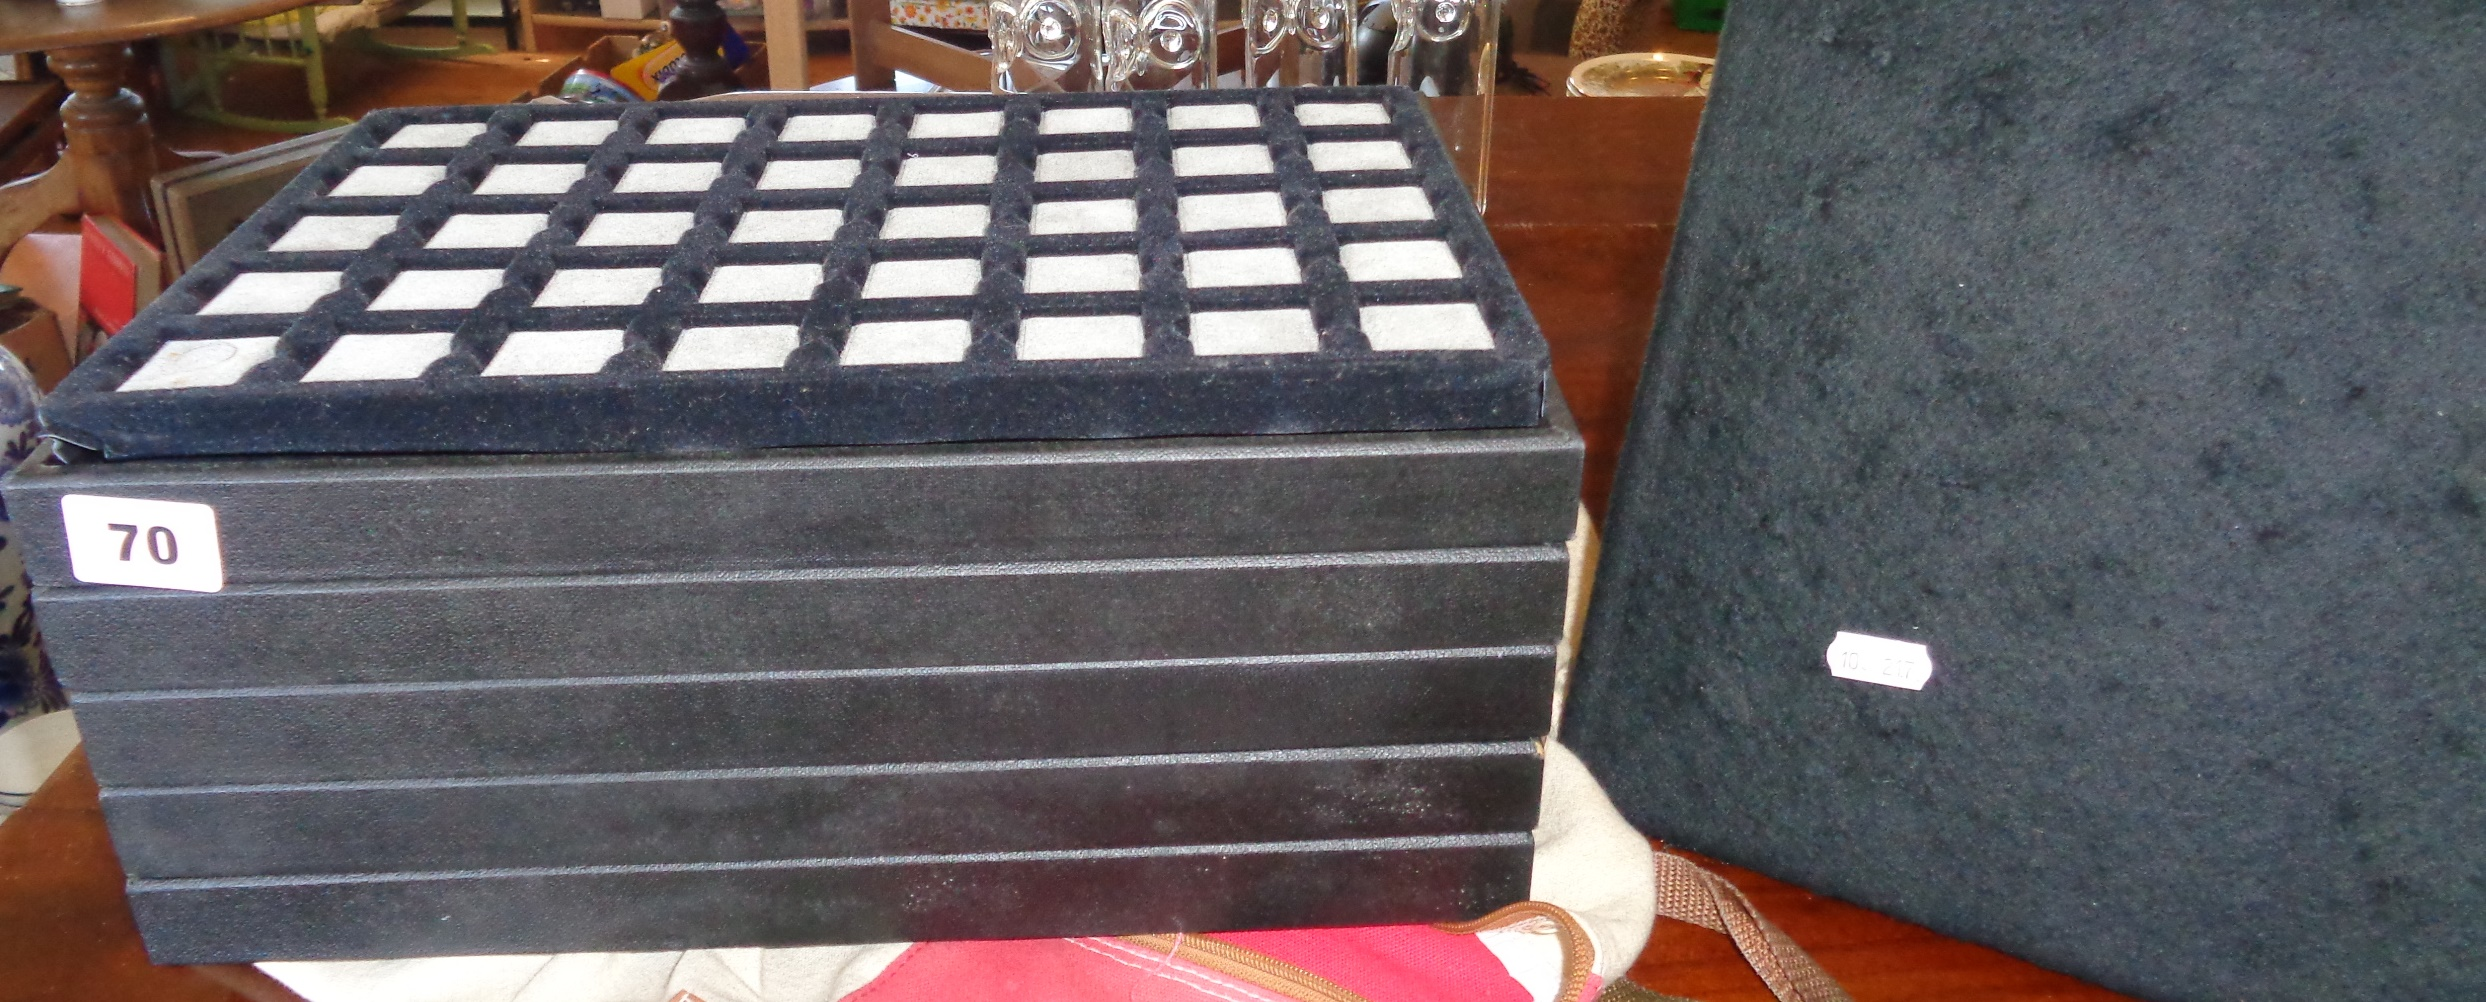 Five jewellery trays